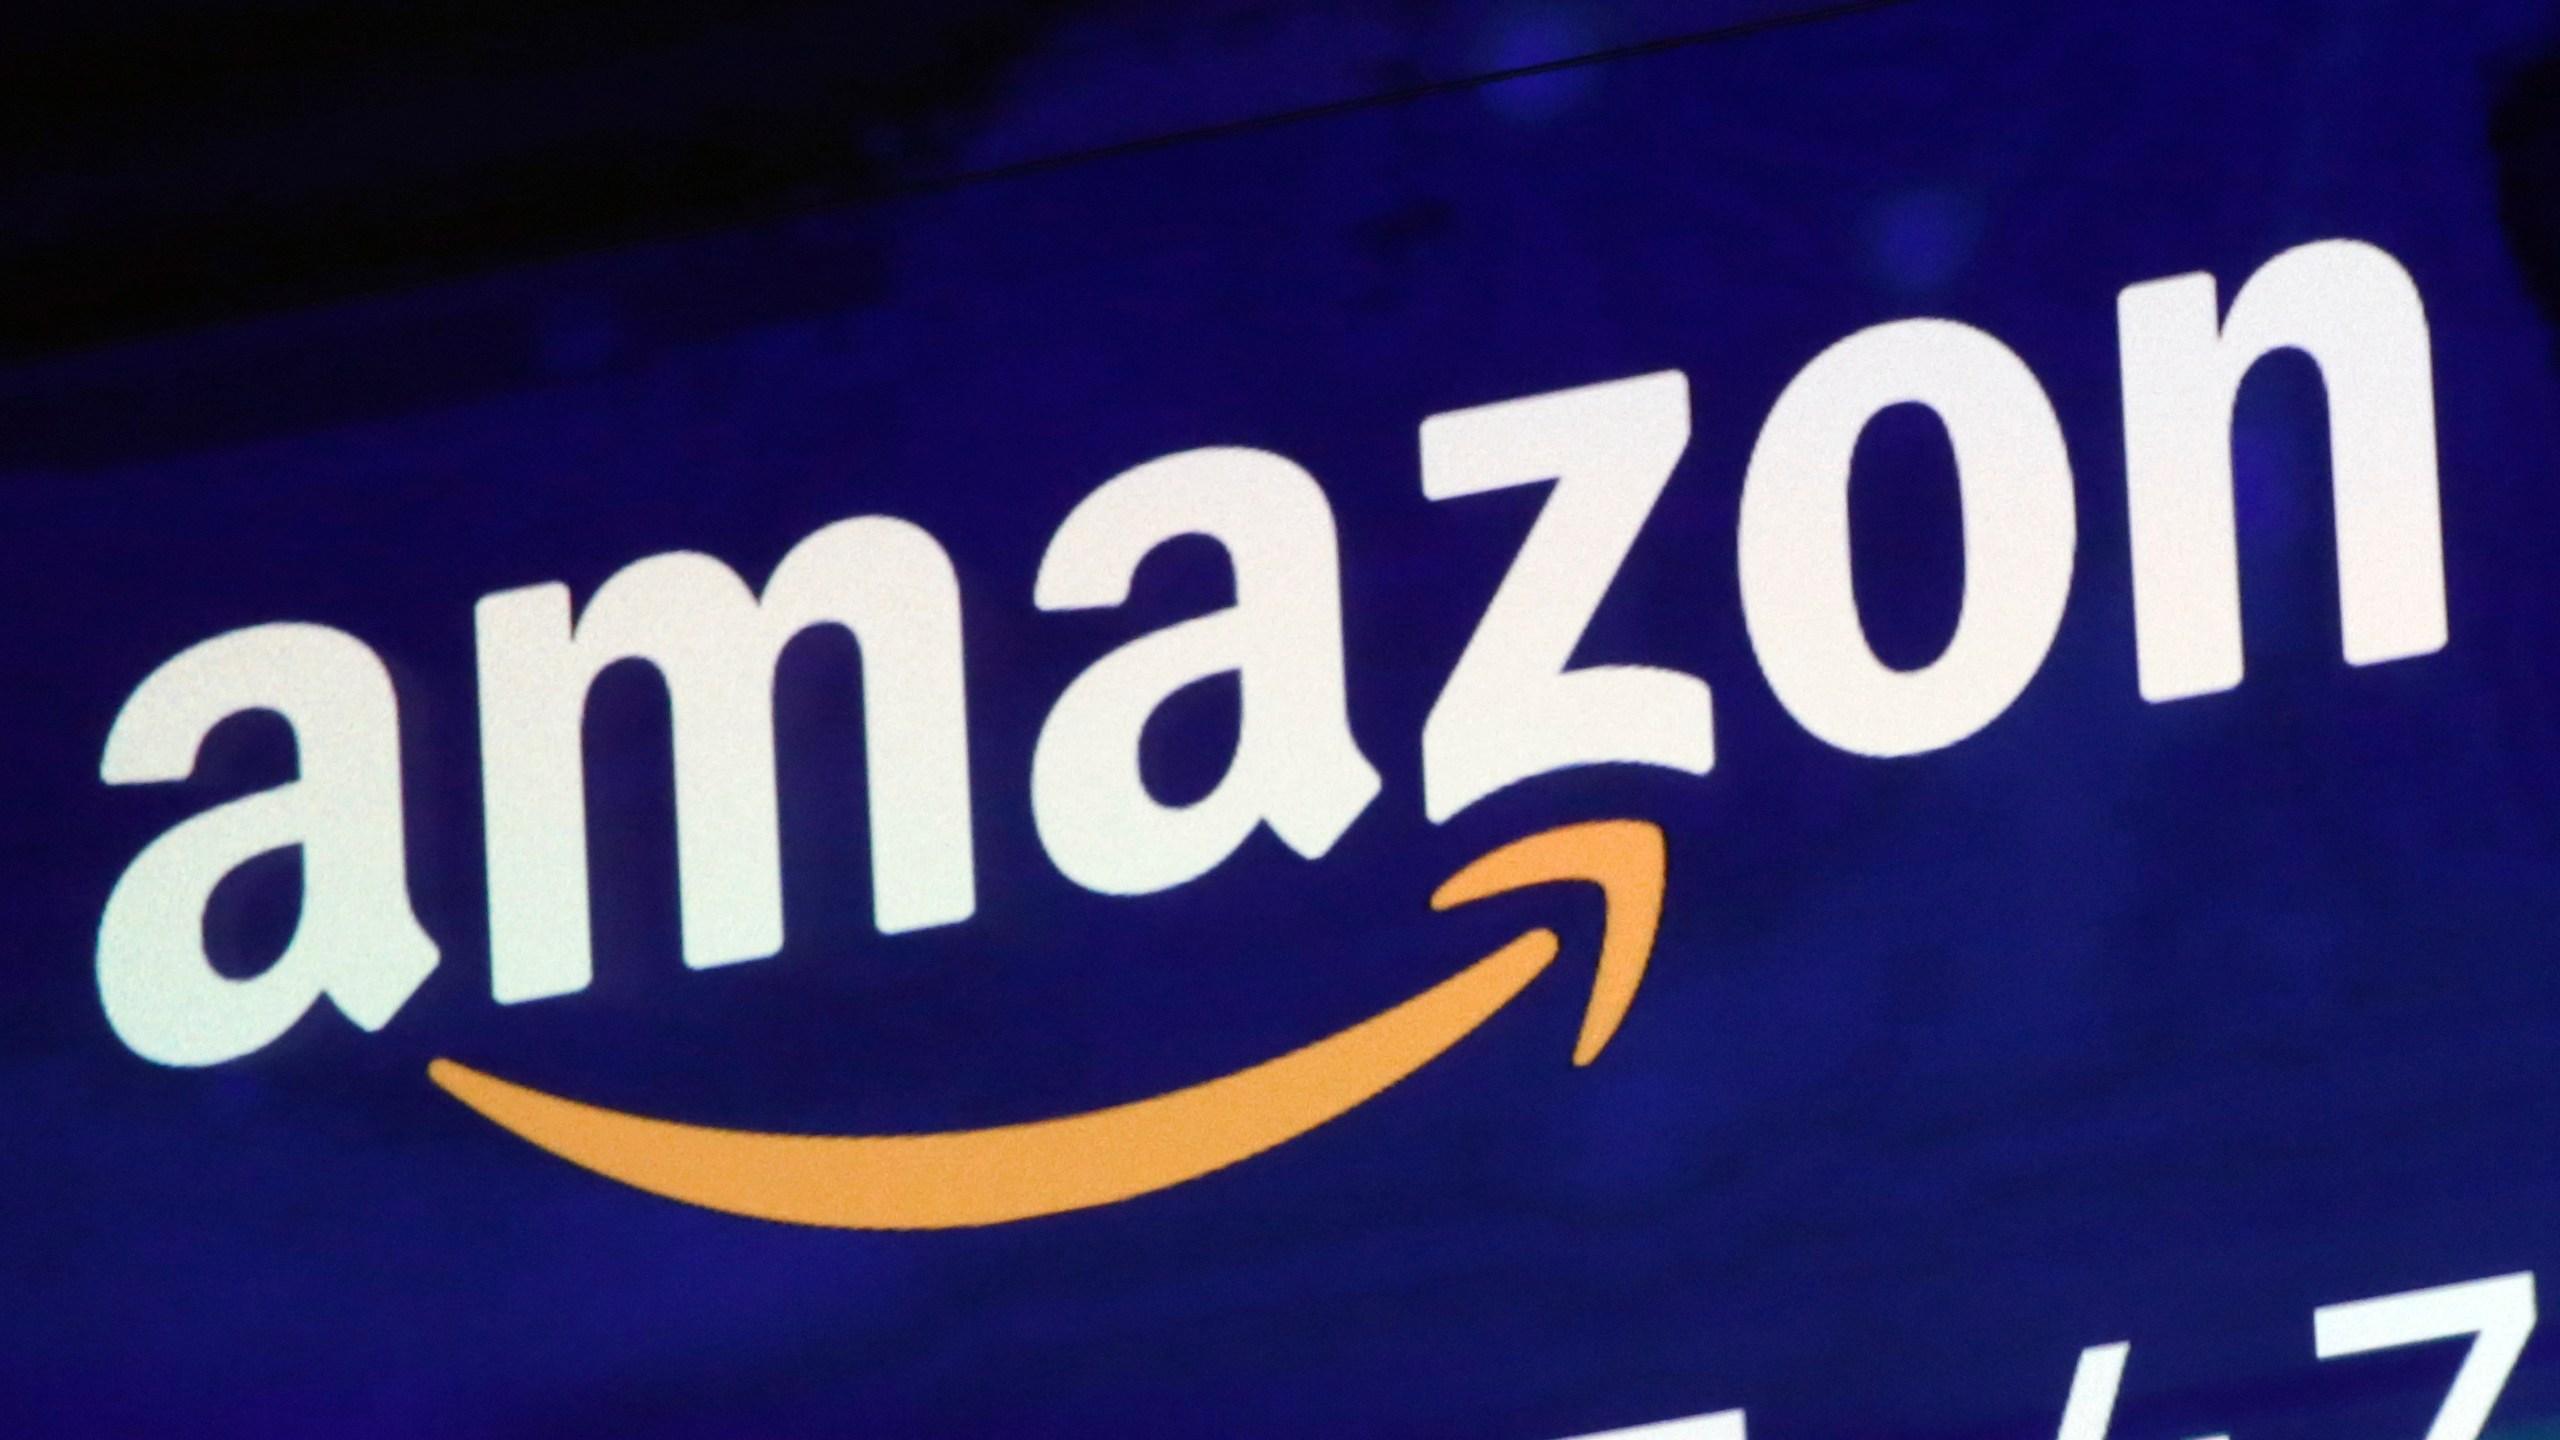 Amazon_Wages_58343-159532.jpg80335271